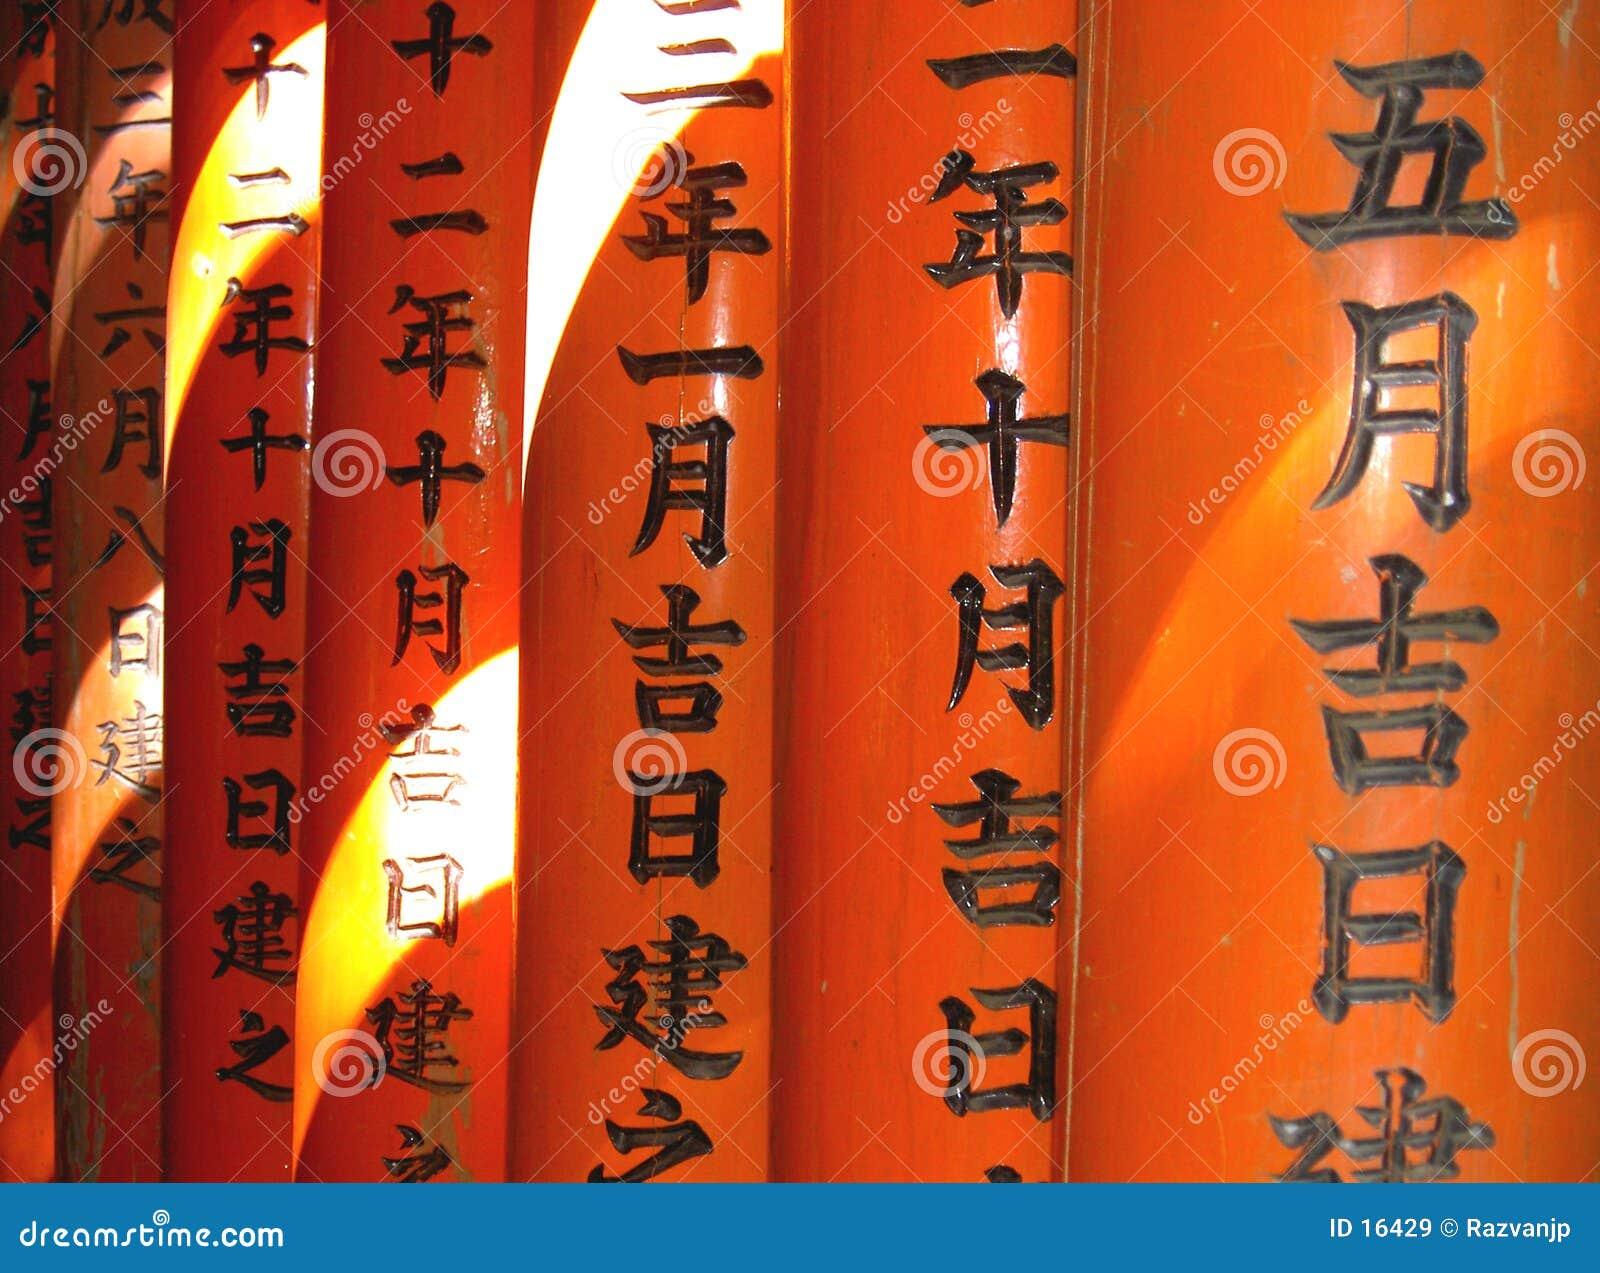 Light, color and japanese writi